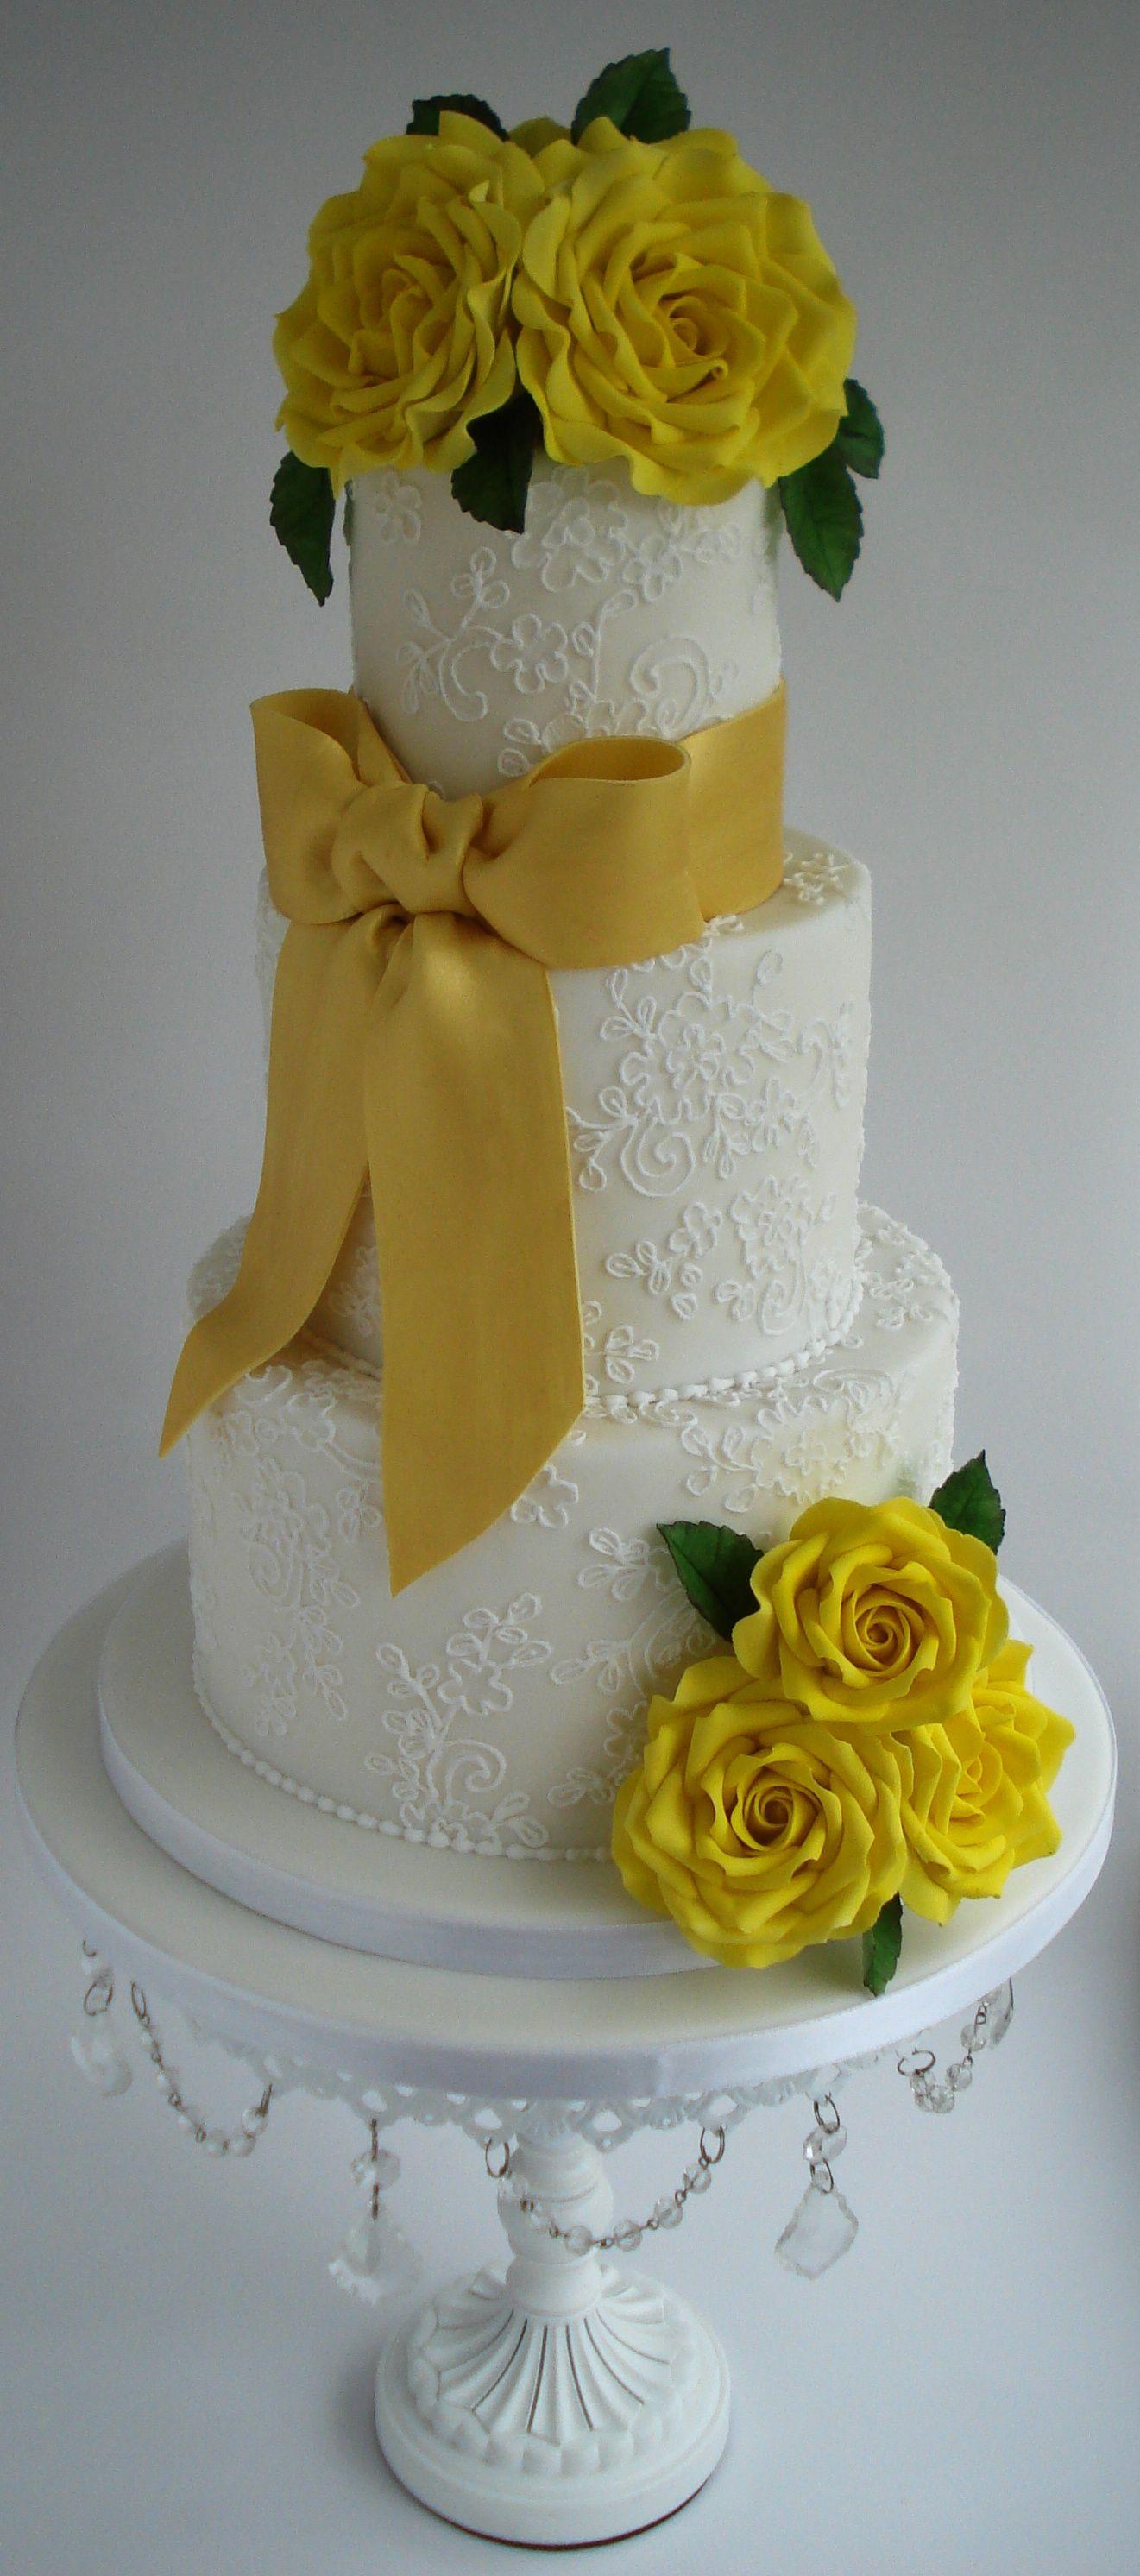 Golden wedding cake | Cakes I Love | Pinterest | Wedding cake, Cake ...